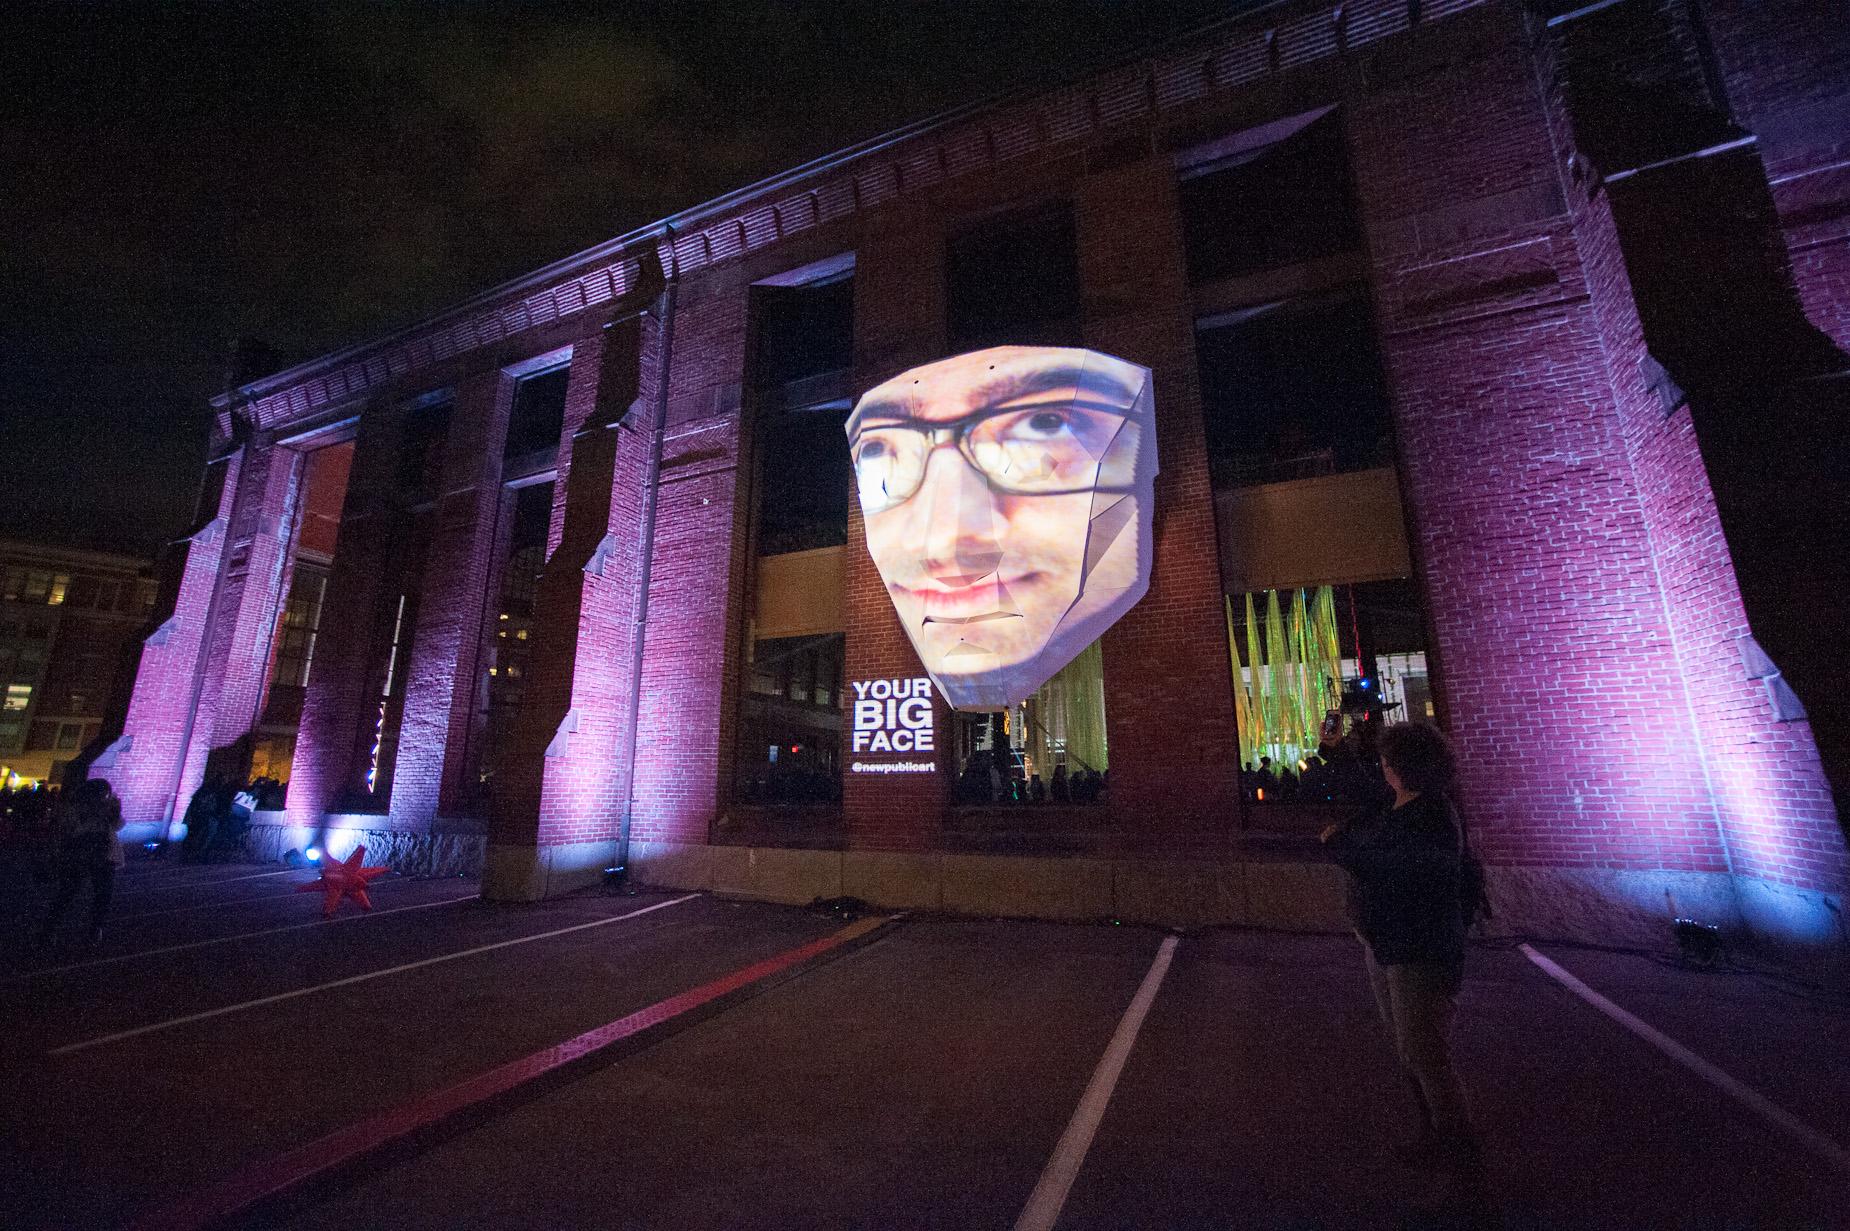 Your Big Face_New American Public Art_Illuminus 2014_3.jpg